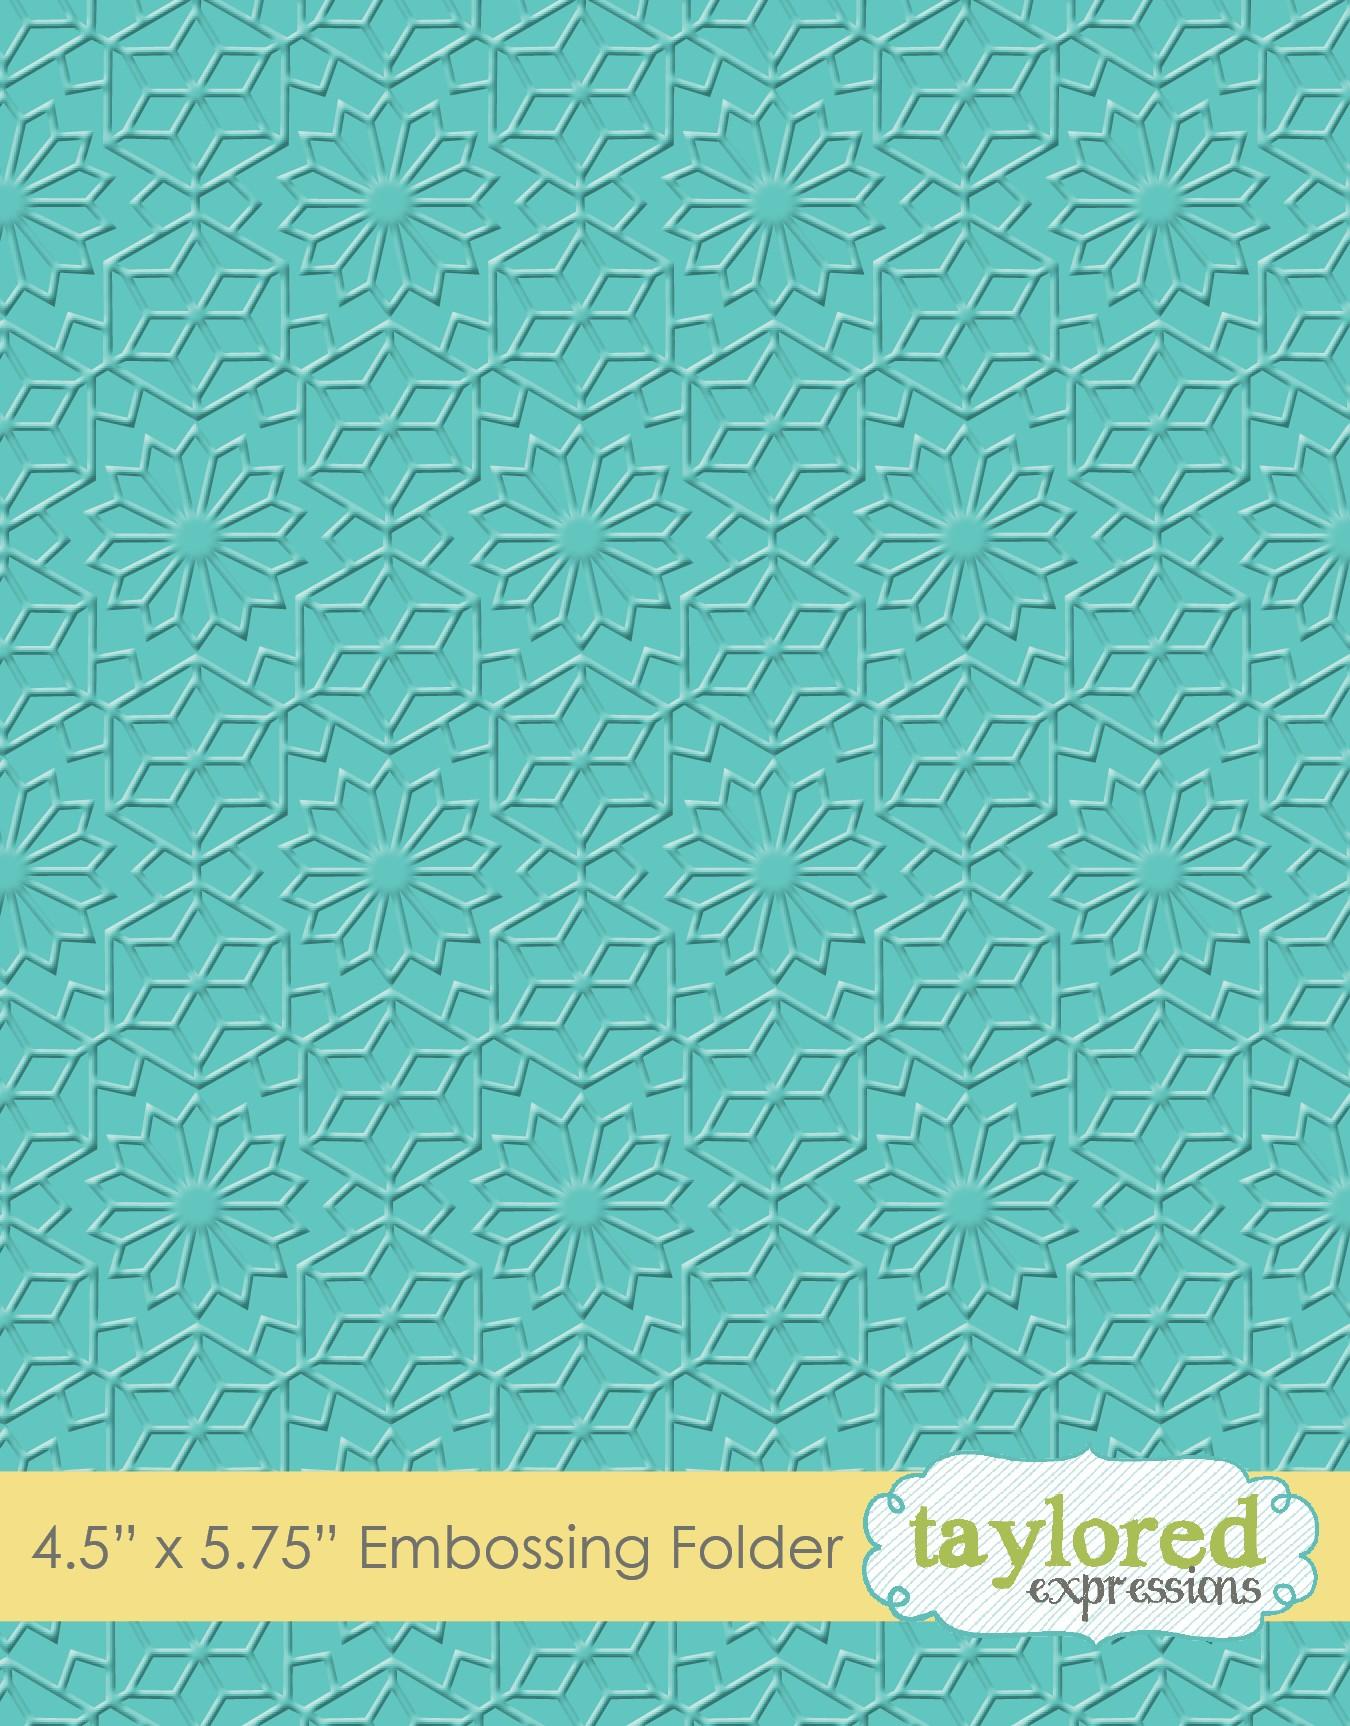 Taylored Expressions Embossing Folder- Kaleidoscope